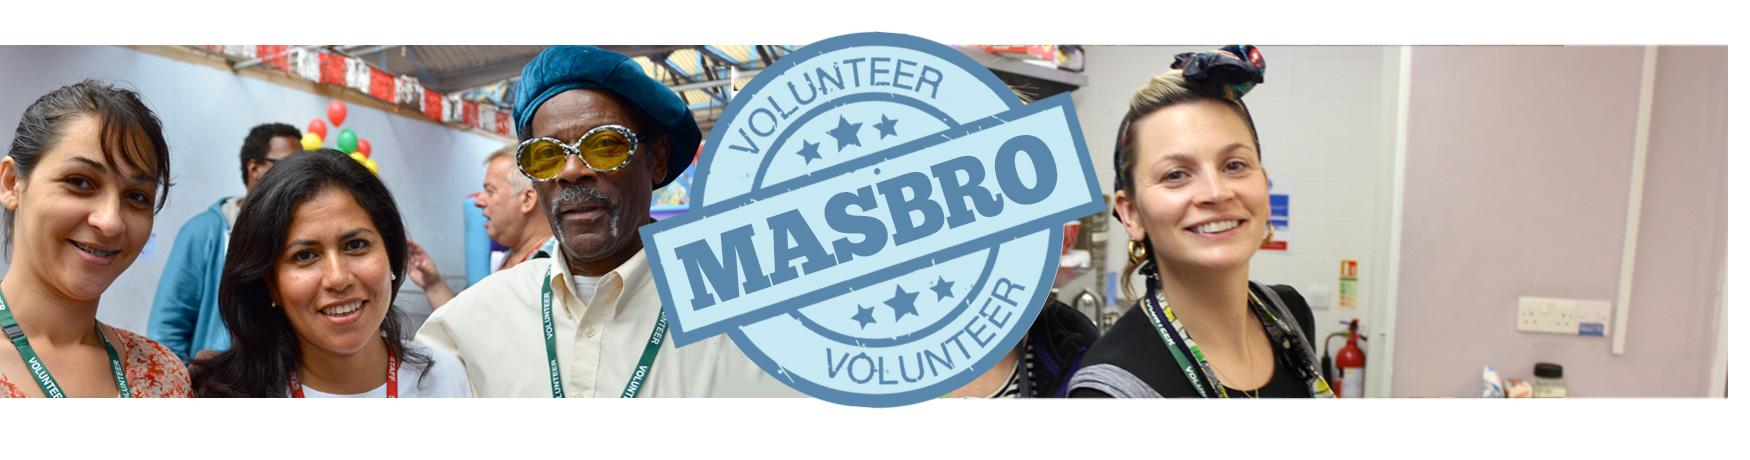 Masbro Volunteer page iphone banner